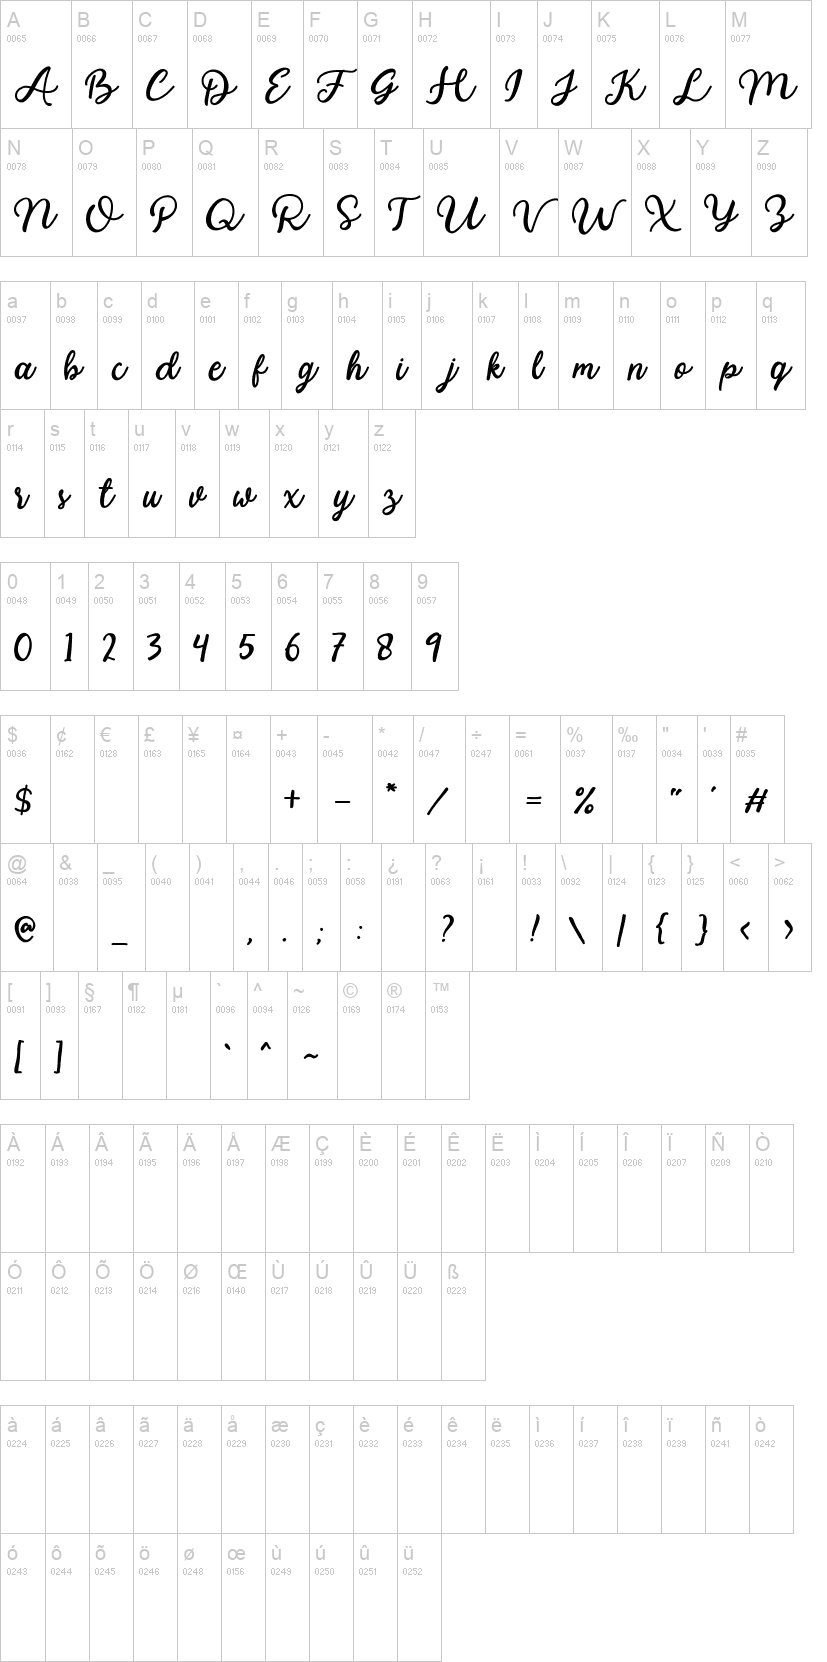 Modesta Font | dafont com